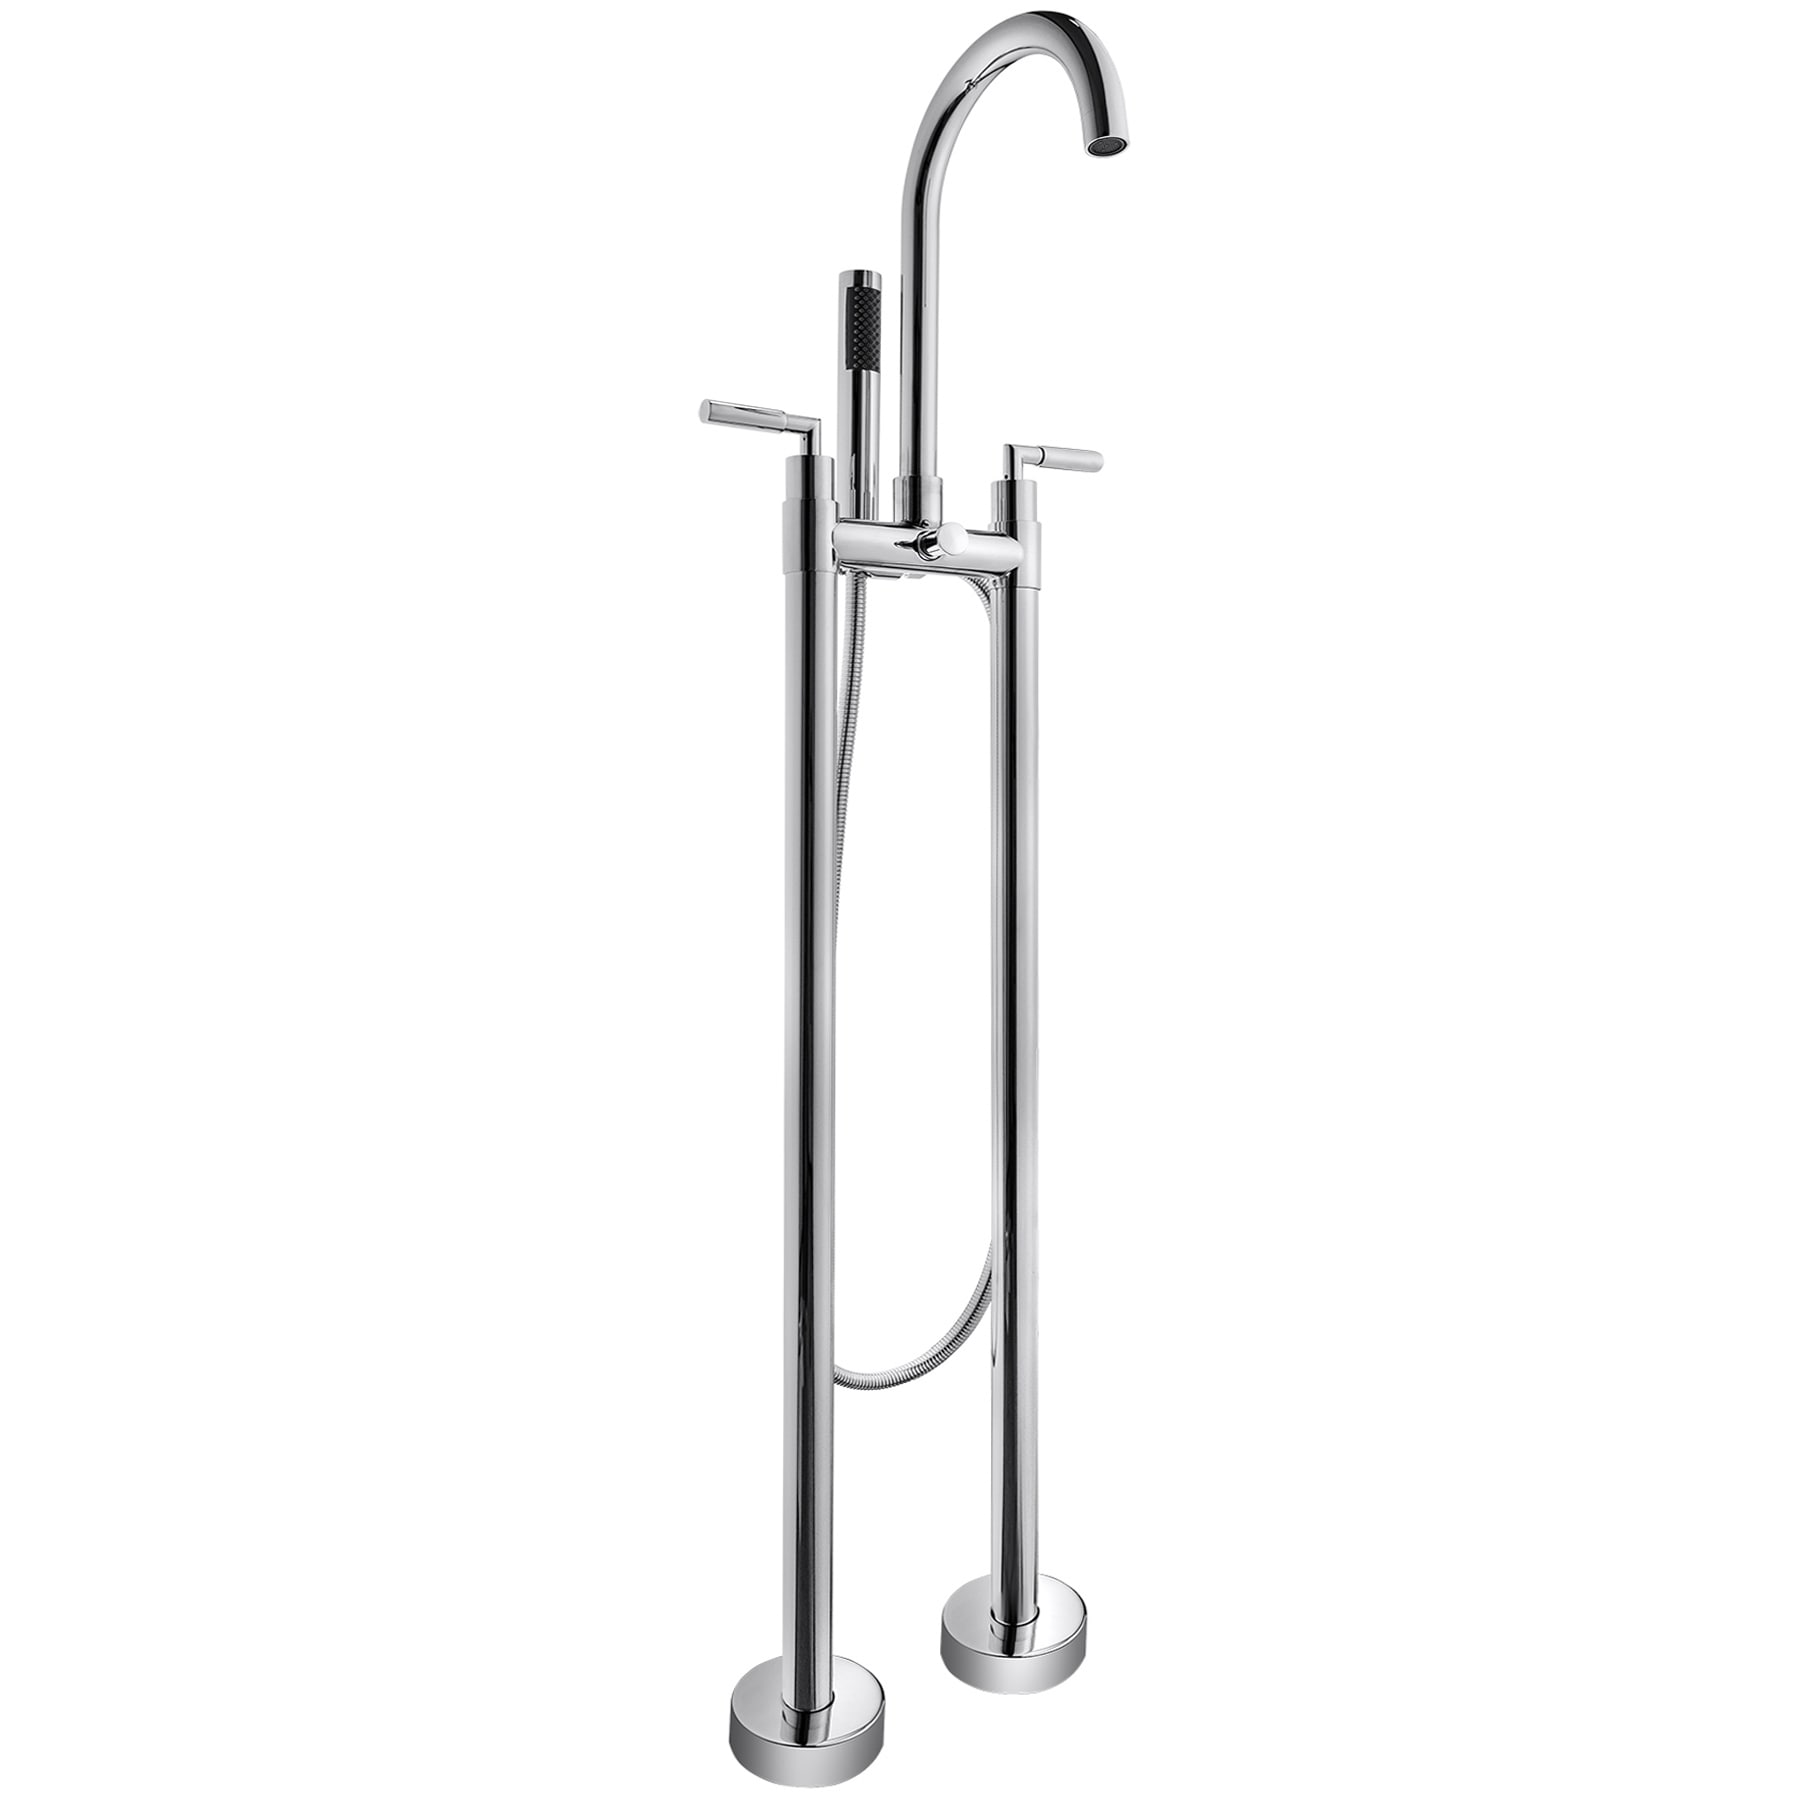 Shop Akdy 46 Floor Mounted Chrome Finish Bath Tub Filler Faucet